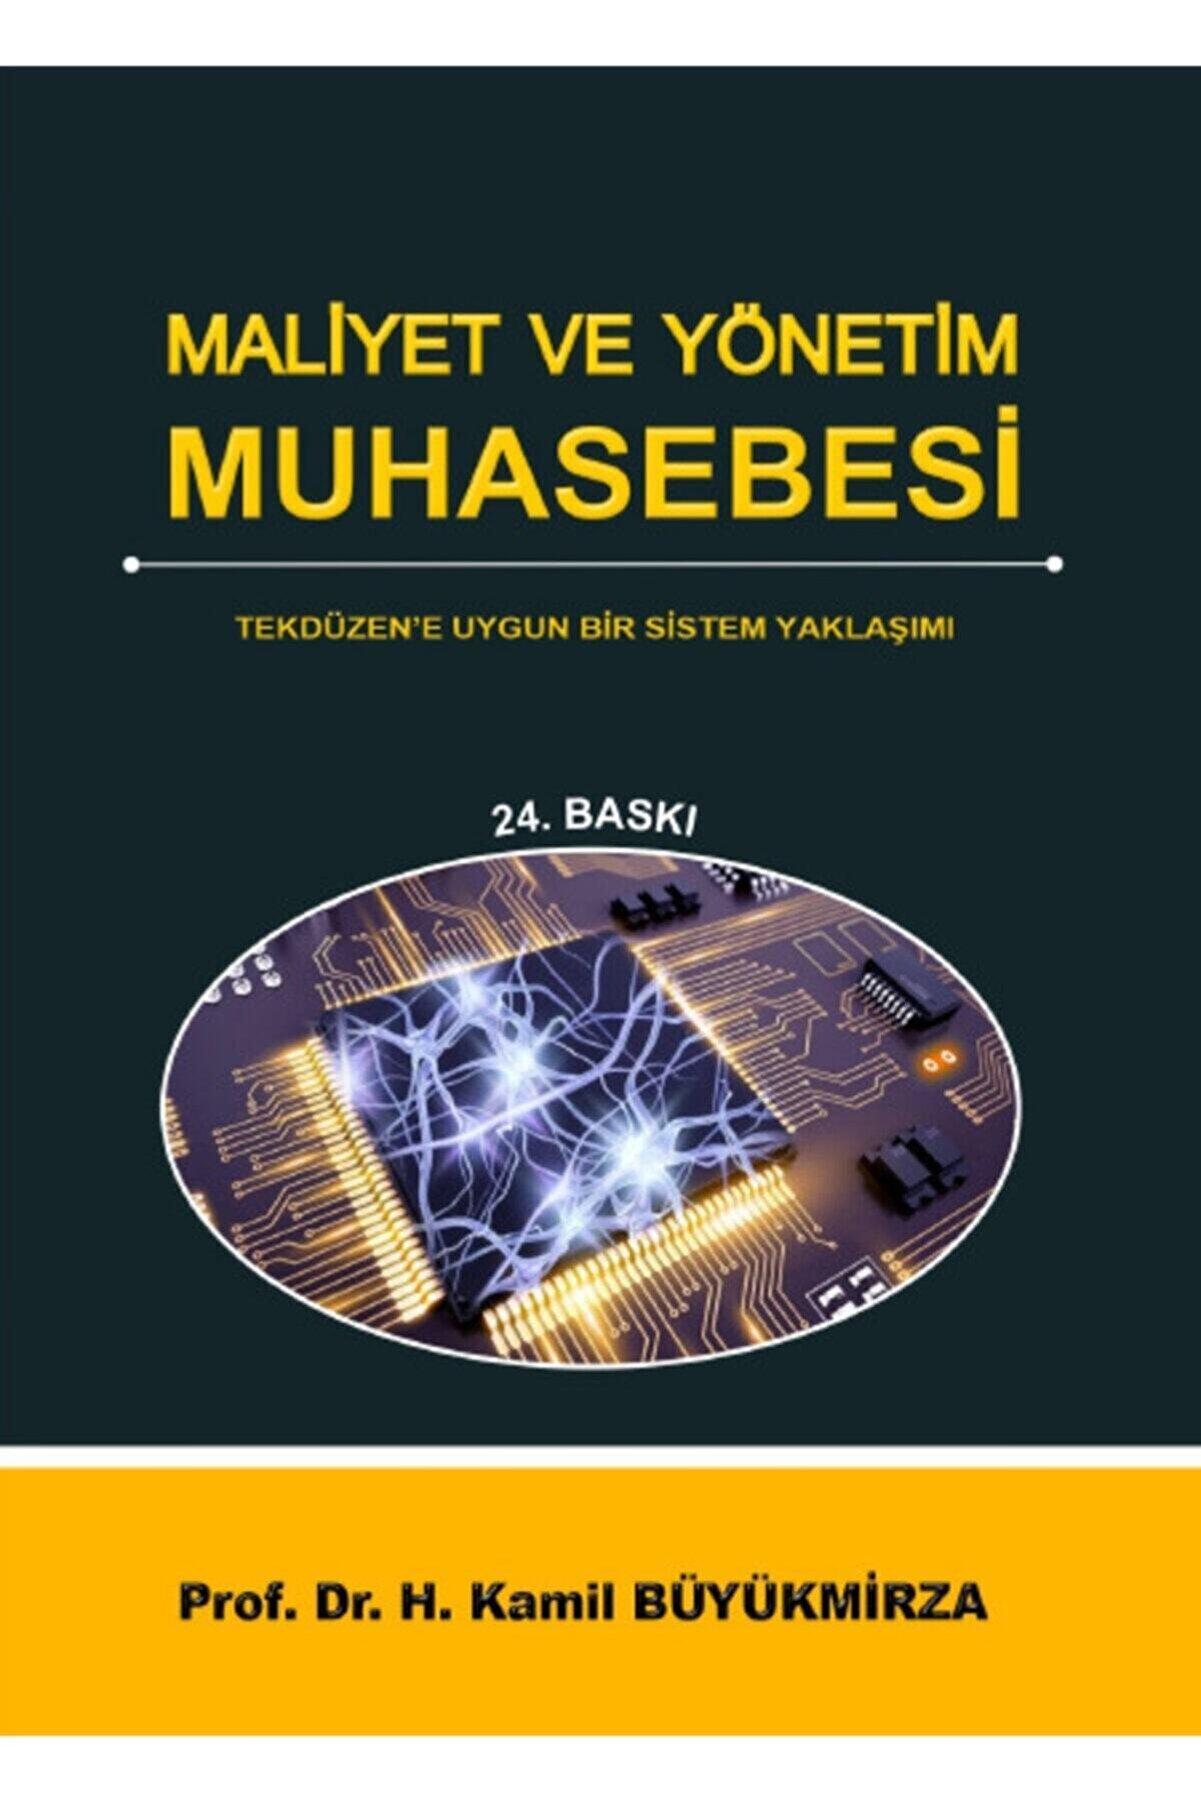 Gazi Kitabevi Maliyet Ve Yönetim Muhasebesi - Prof. Dr. Kamil Büyükmirza